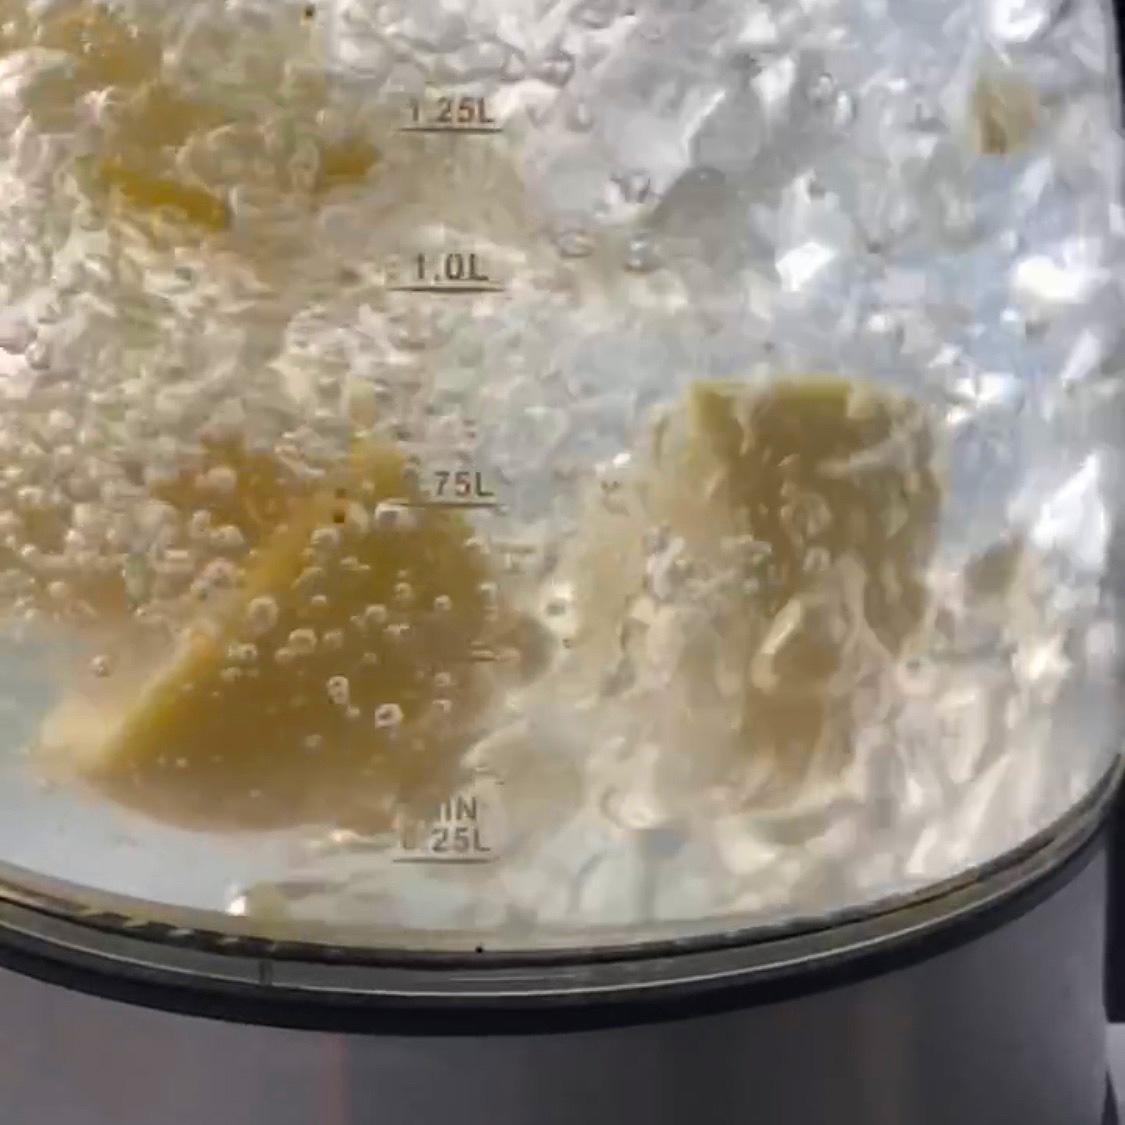 lemons being boiled in kettle